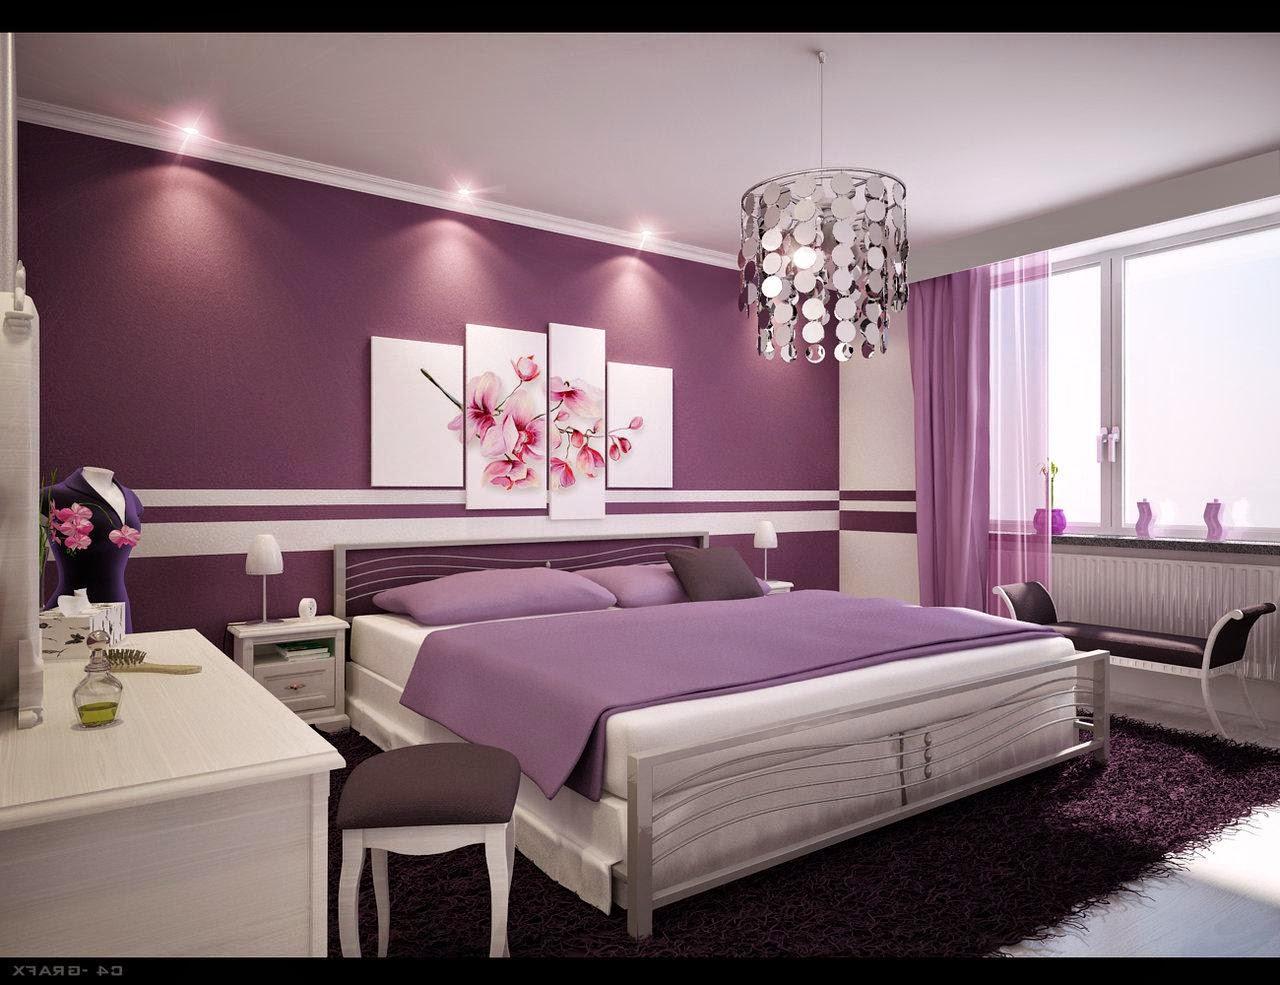 5 Amazing Modern Interior Design Ideas | Residence Furniture Ideas on scottish themed party ideas, scottish decorating style, scottish wedding ideas, scottish craft ideas, scottish interior decorating, scottish country decorating,